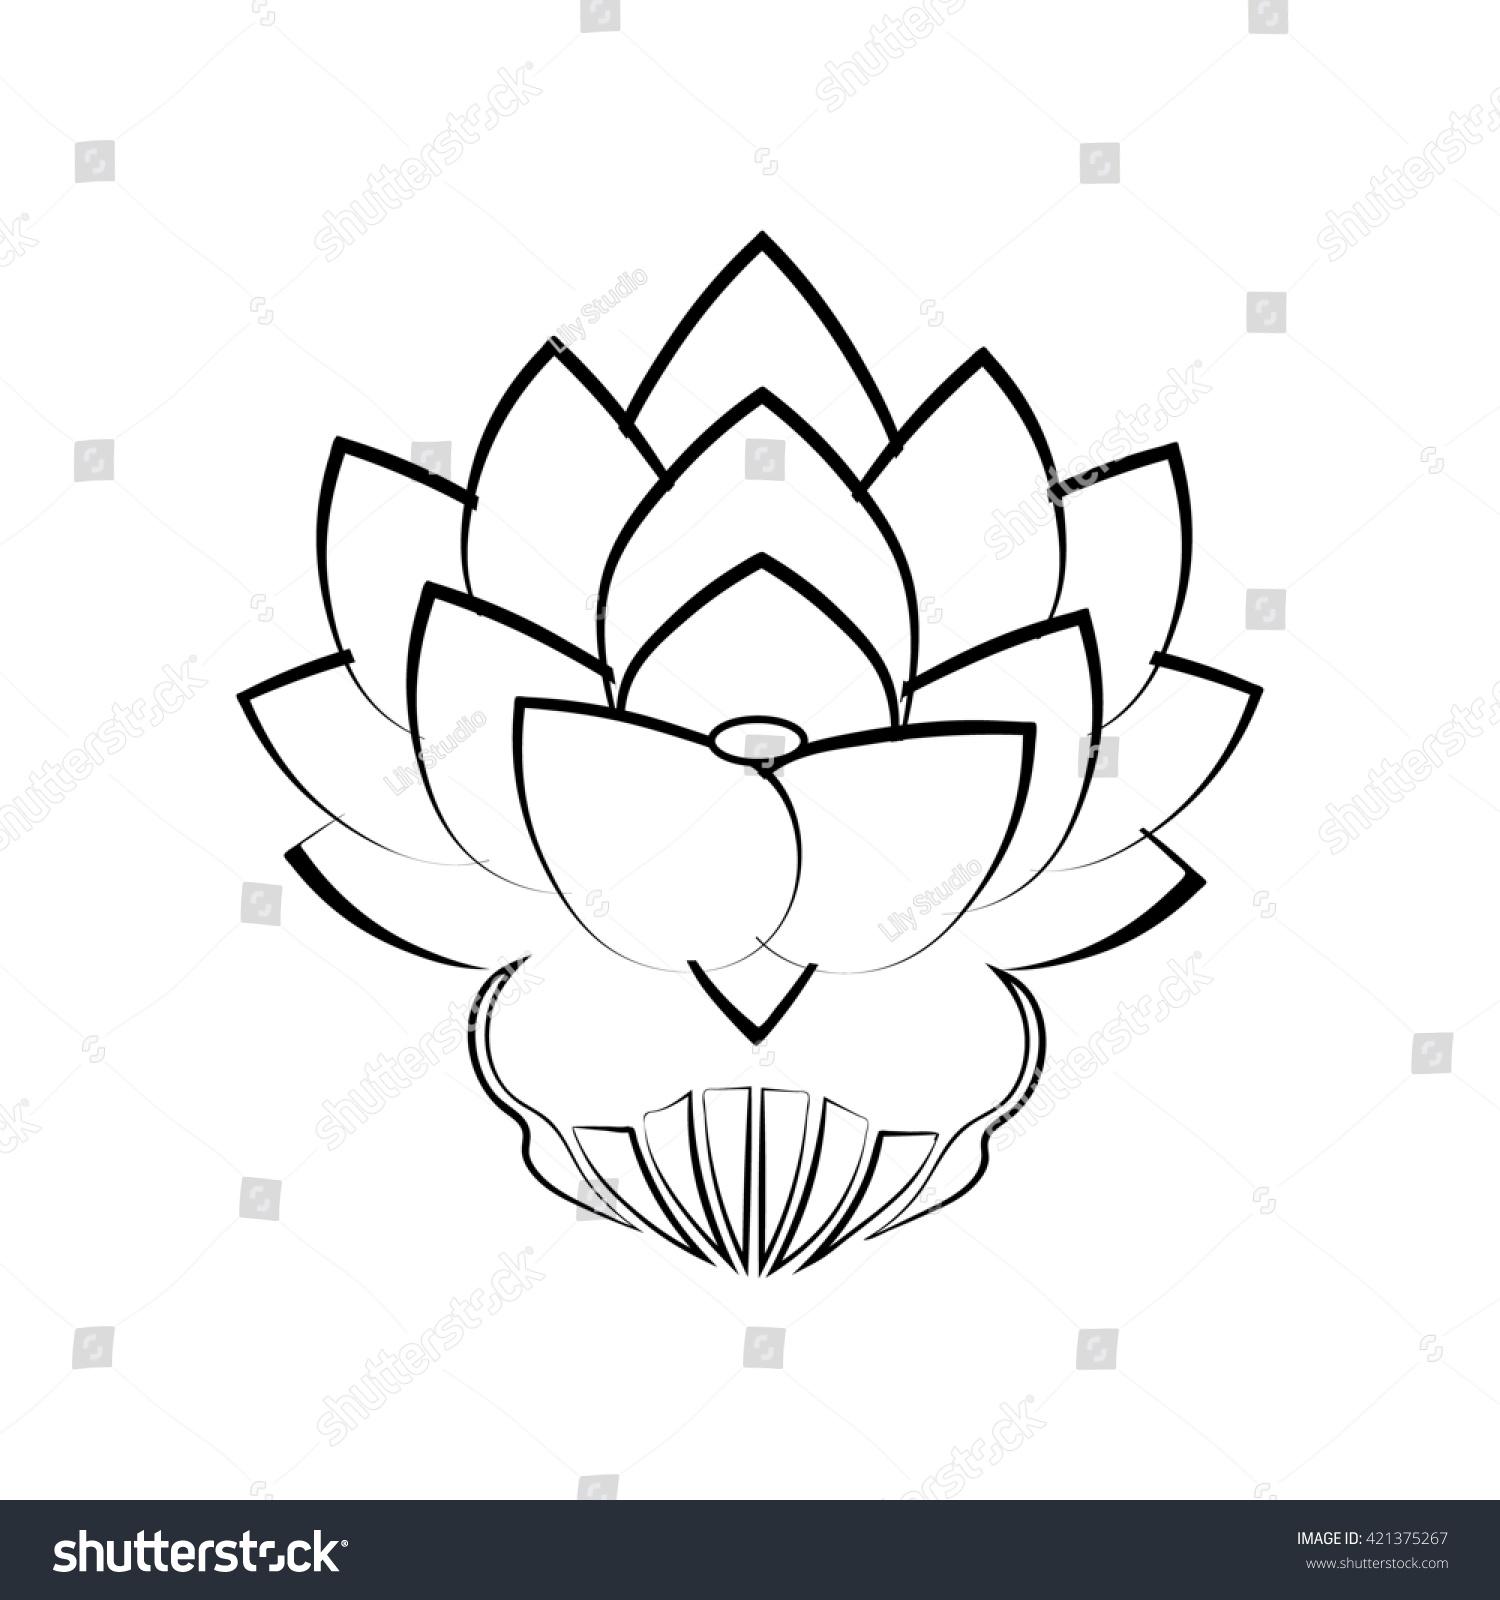 Royalty free black stylized image of a lotus flower 421375267 black stylized image of a lotus flower on a white background tattoo the symbol izmirmasajfo